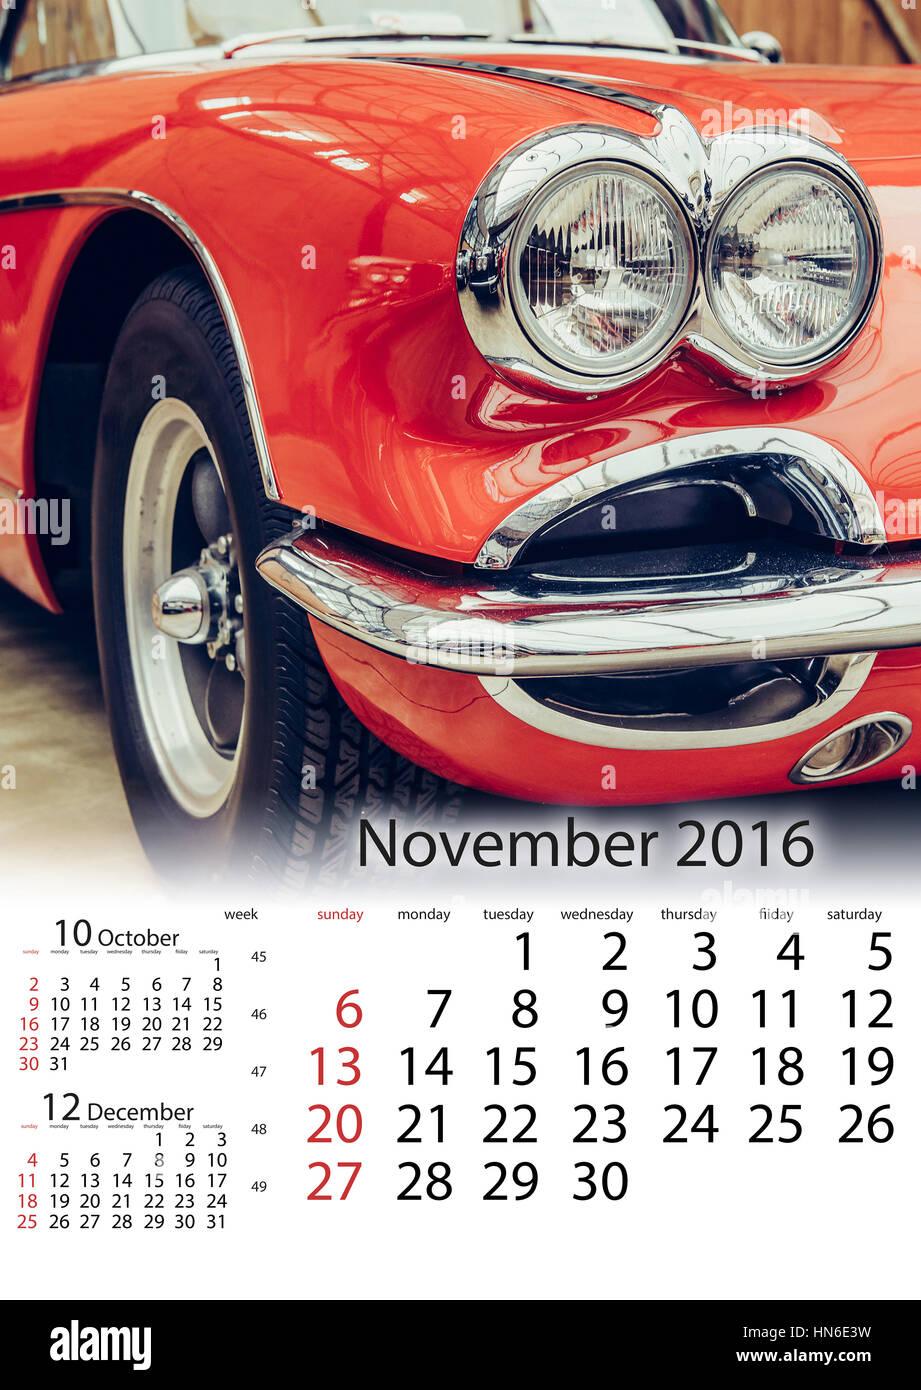 Calendar November 2016 - vintage transport retro car Stock Photo ...